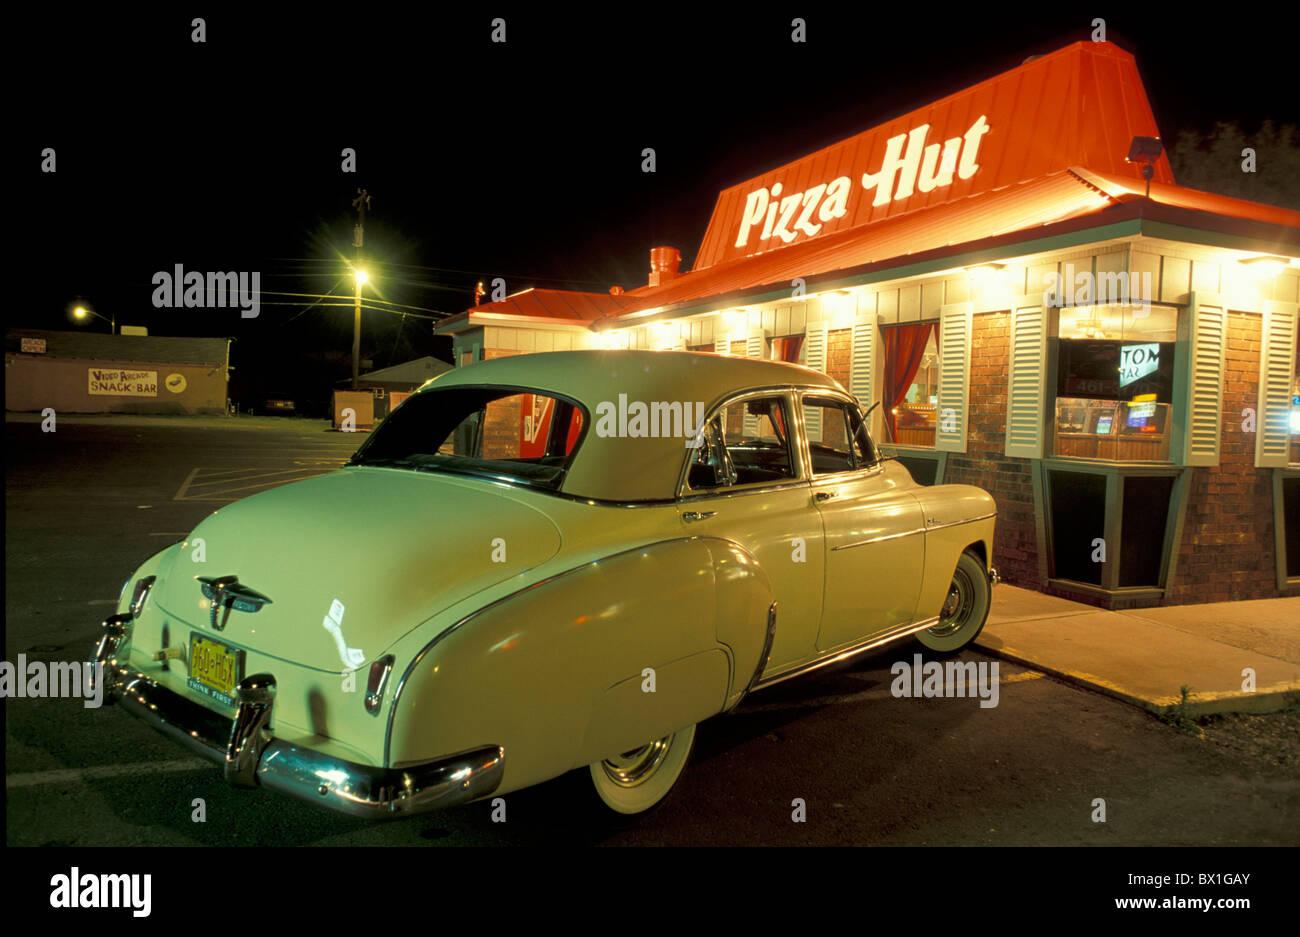 New Mexico Oldtimer Nacht Essen Auto Pizza Hut Route 66 Tucumcari USA Amerika Vereinigte Staaten Stockbild